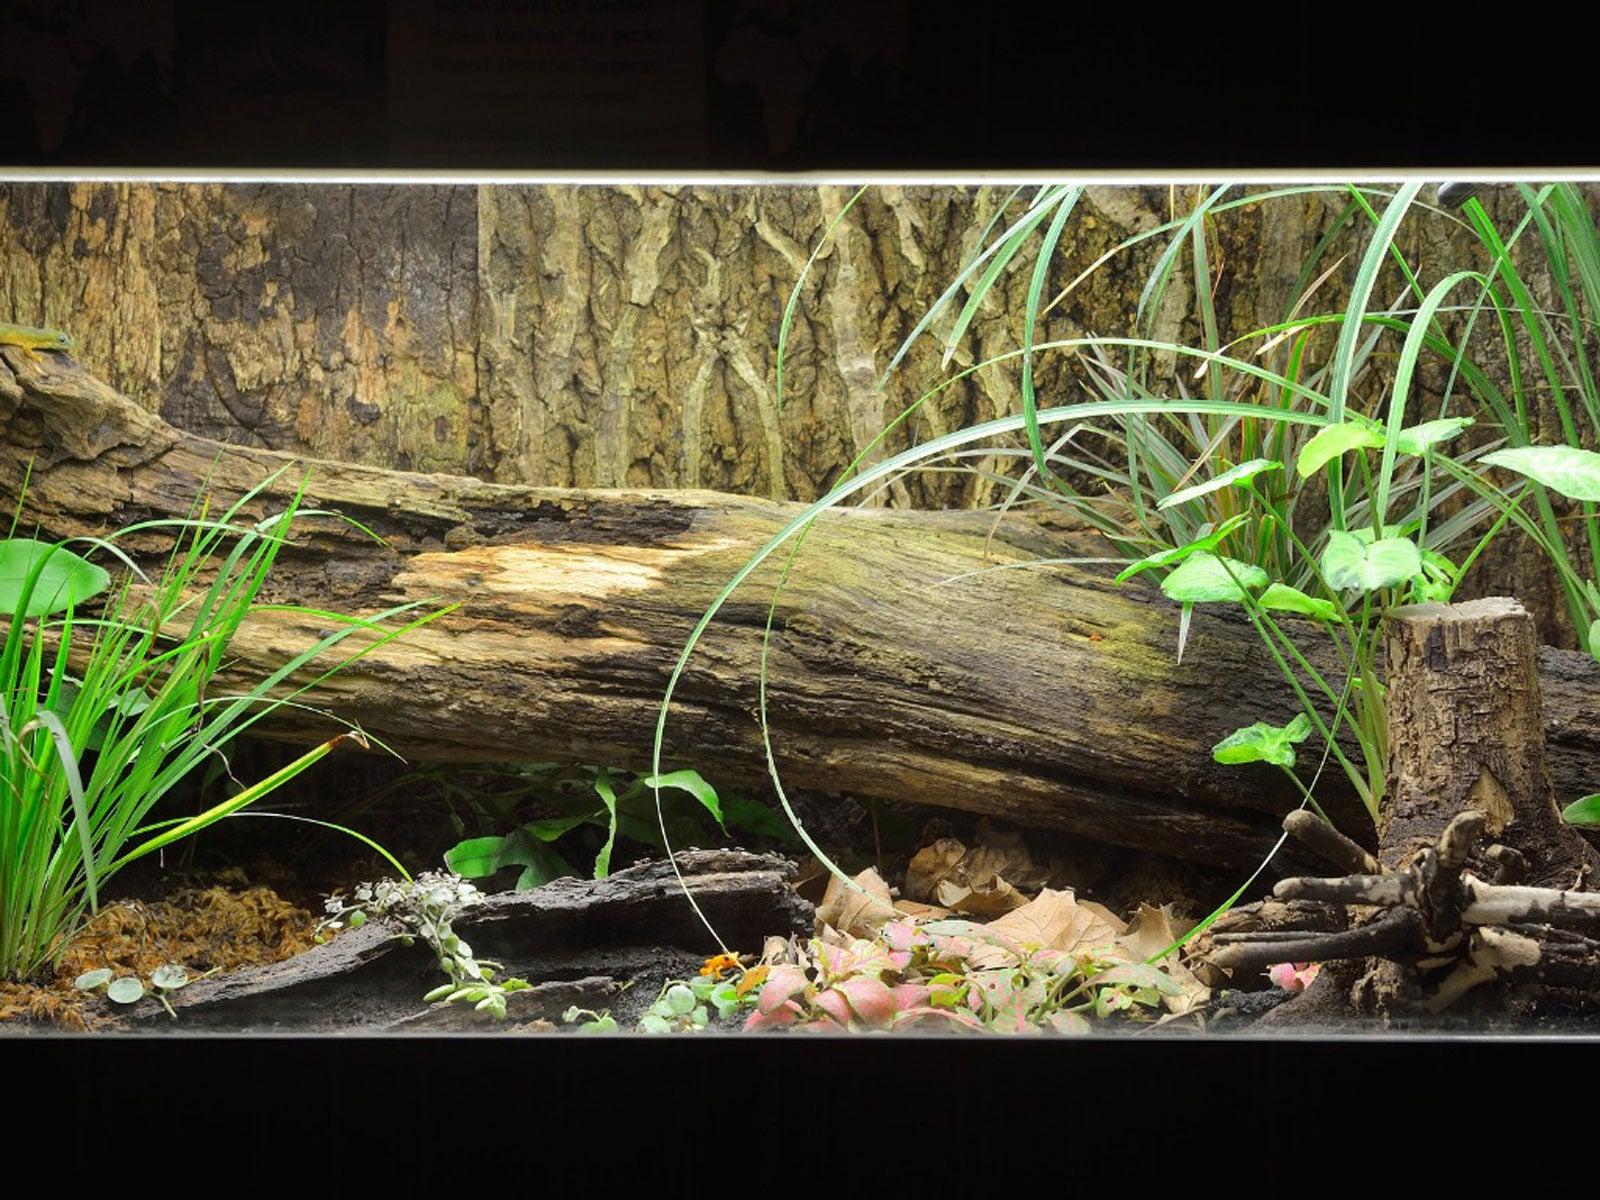 Fish Tank Terrarium Converting A Fish Tank Into A Terrarium Garden